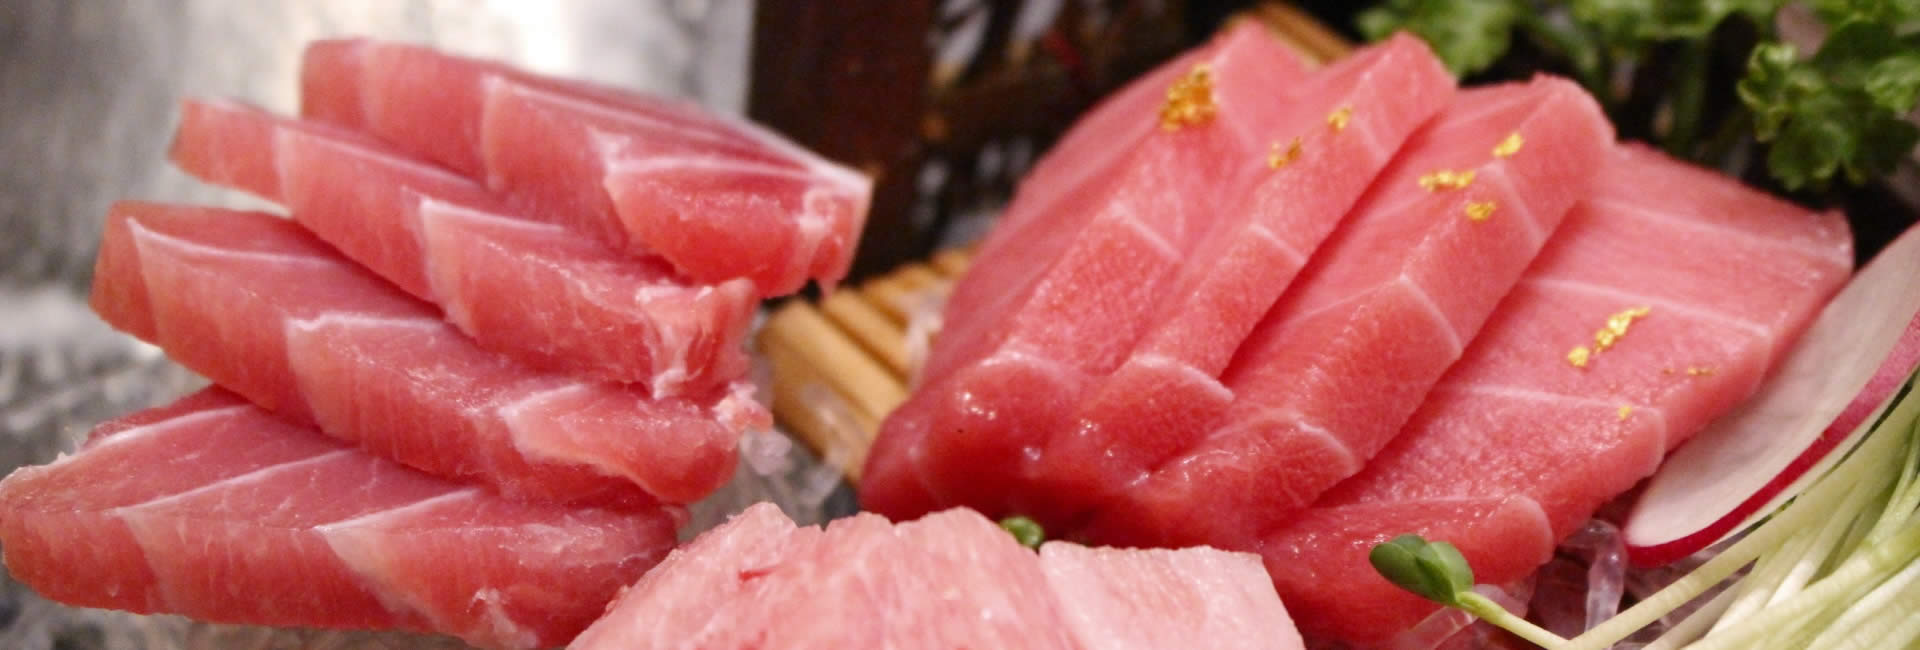 dietologi cremona - pesce